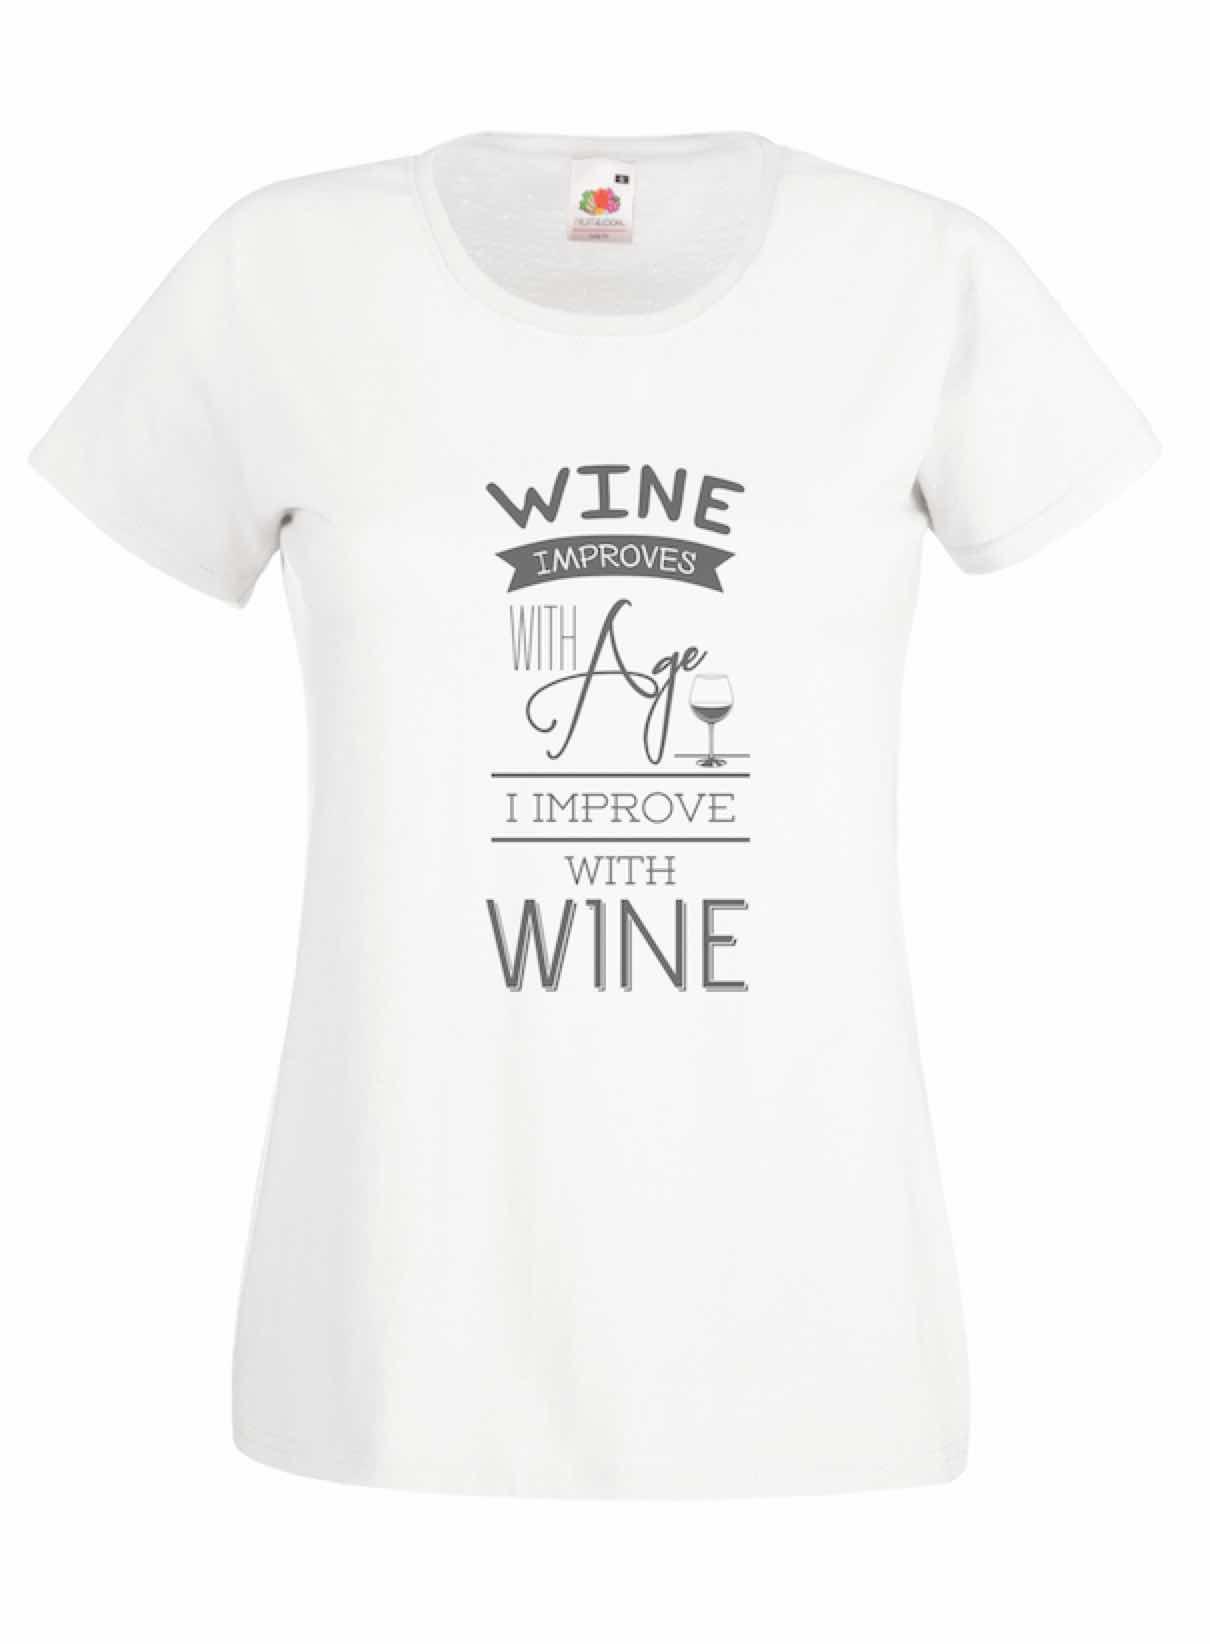 Wine Improves design for t-shirt, hoodie & sweatshirt